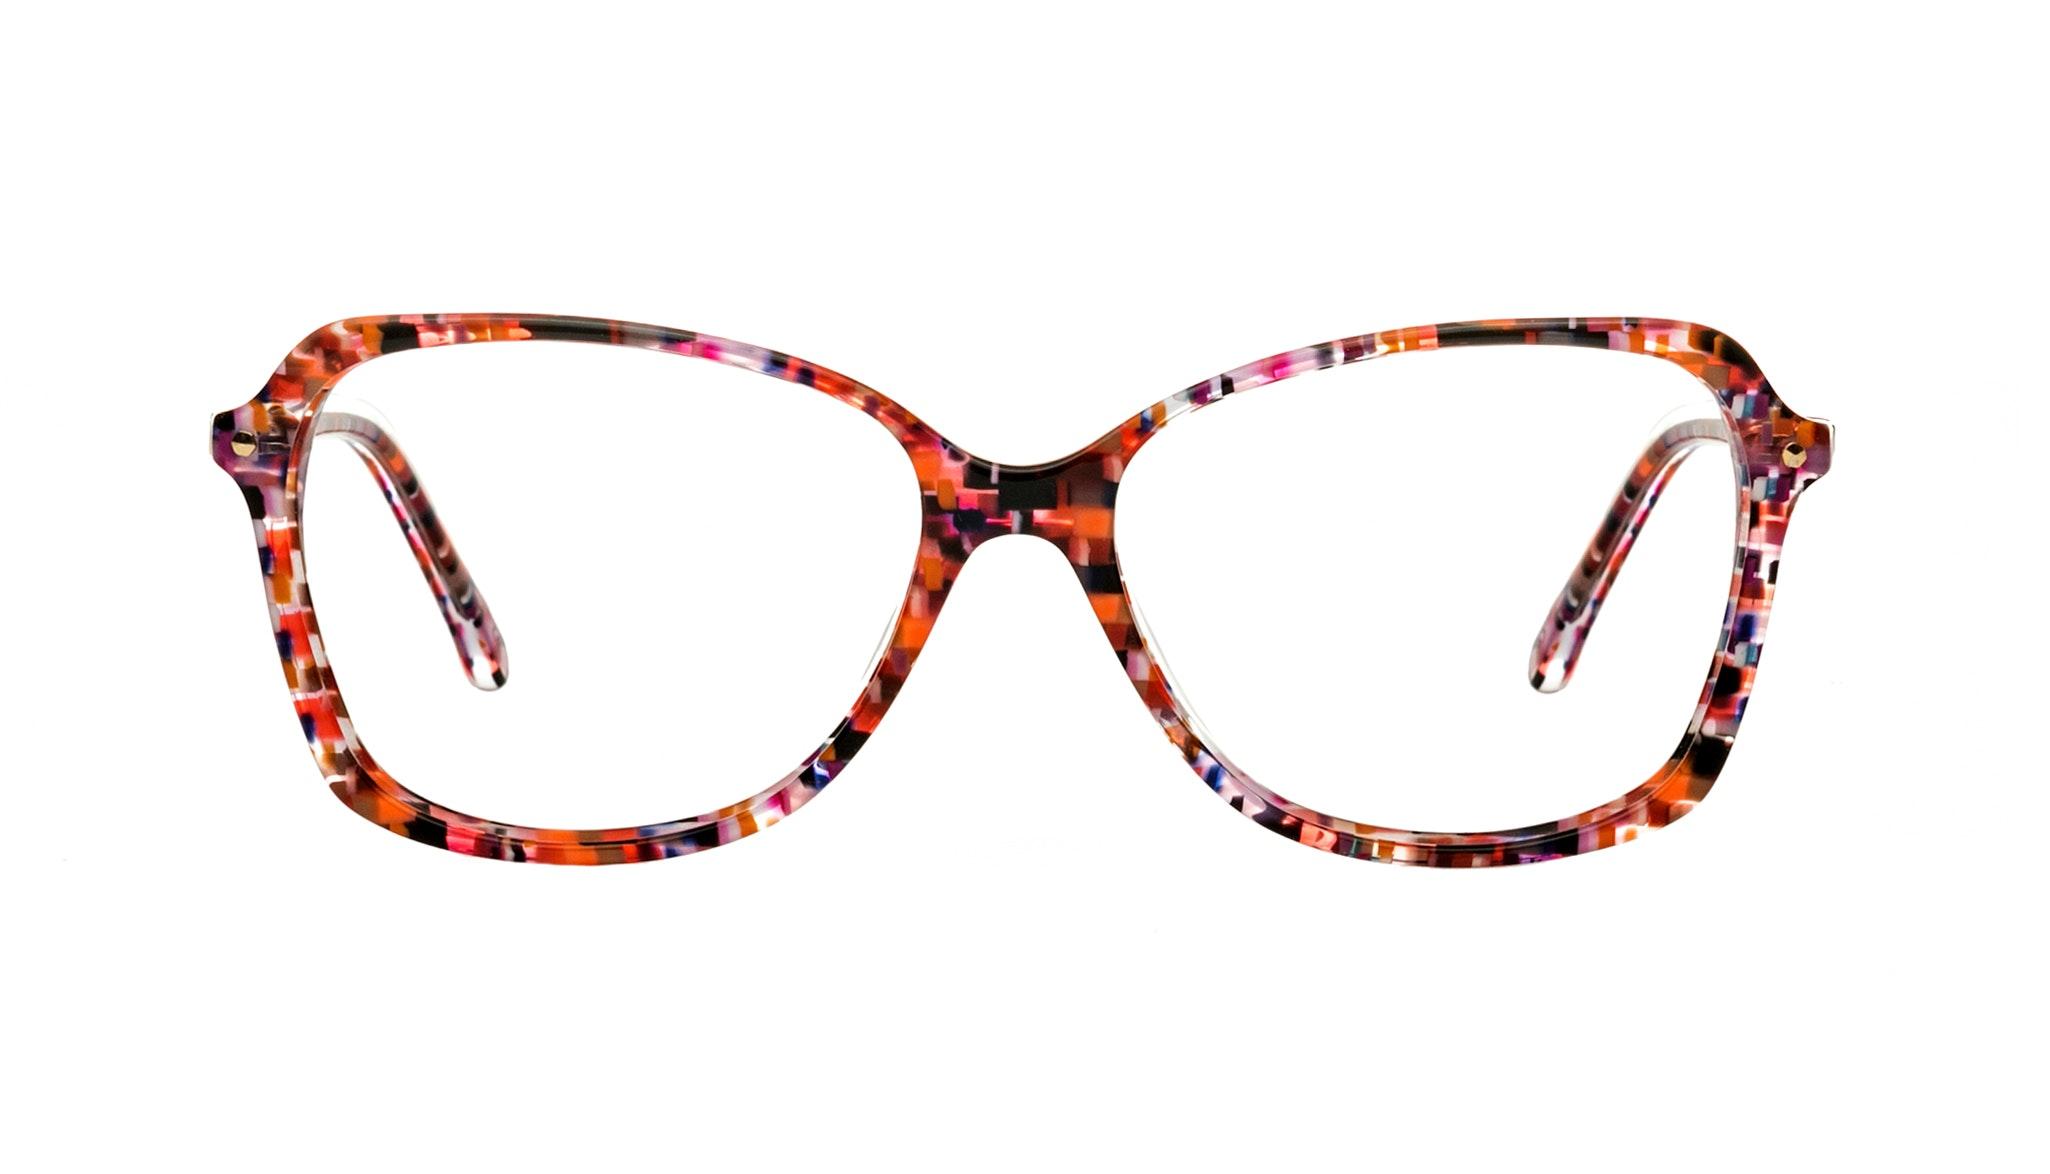 Affordable Fashion Glasses Rectangle Eyeglasses Women Captivate Berry